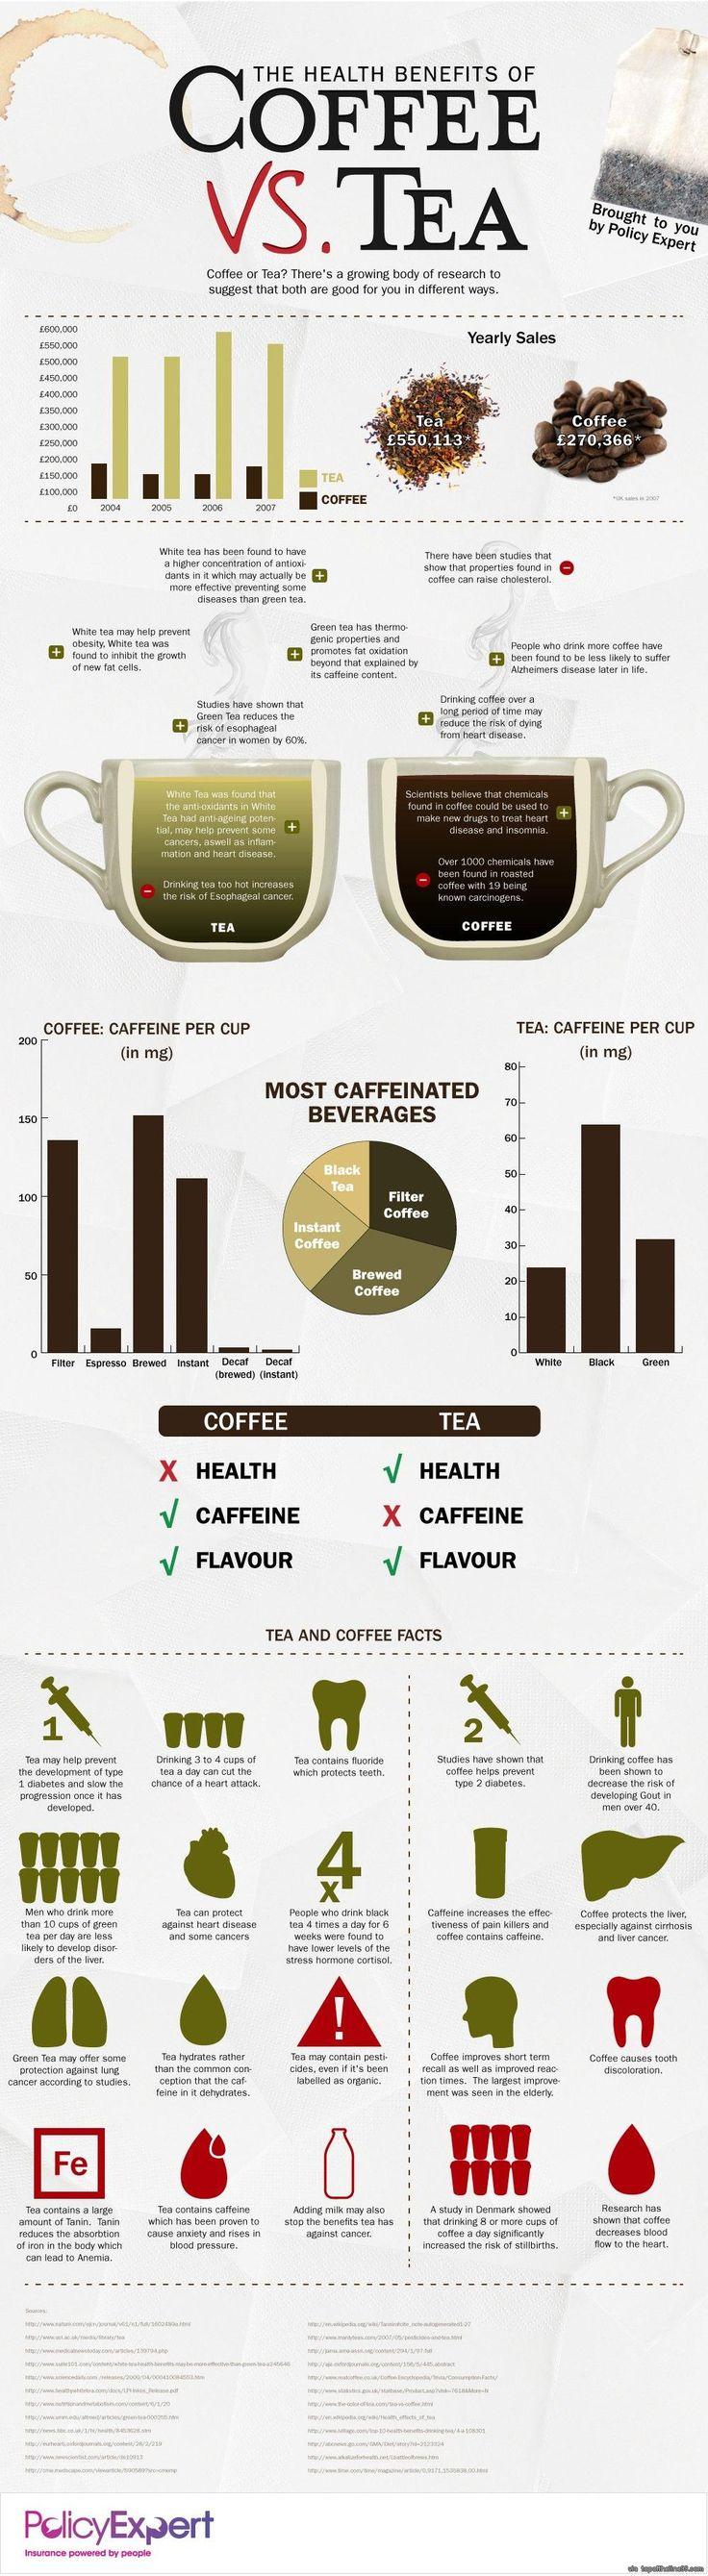 Coffee and Tea Health Infographic